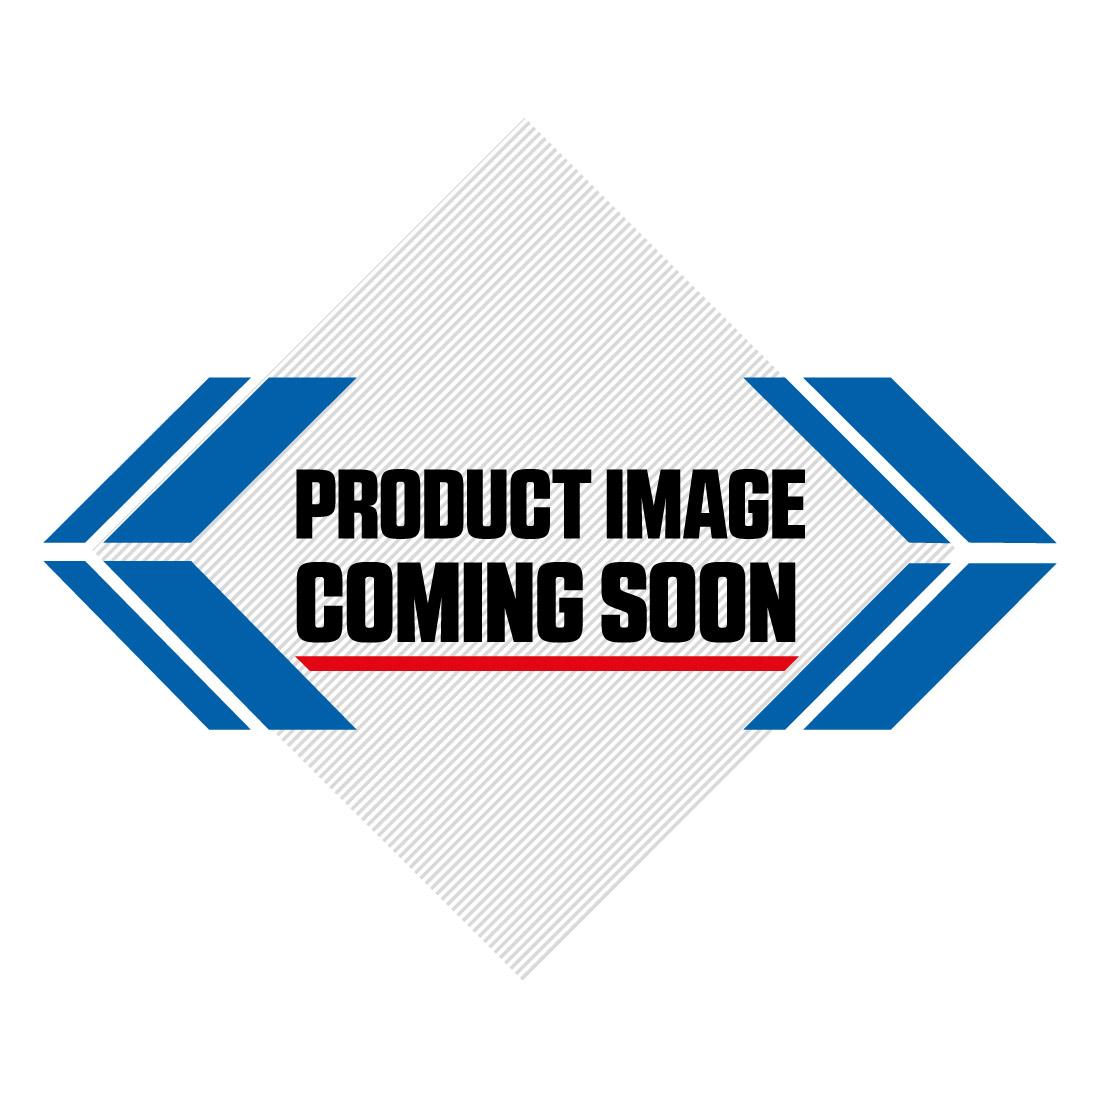 DJI Mavic Pro Platinum Drone Image-3>